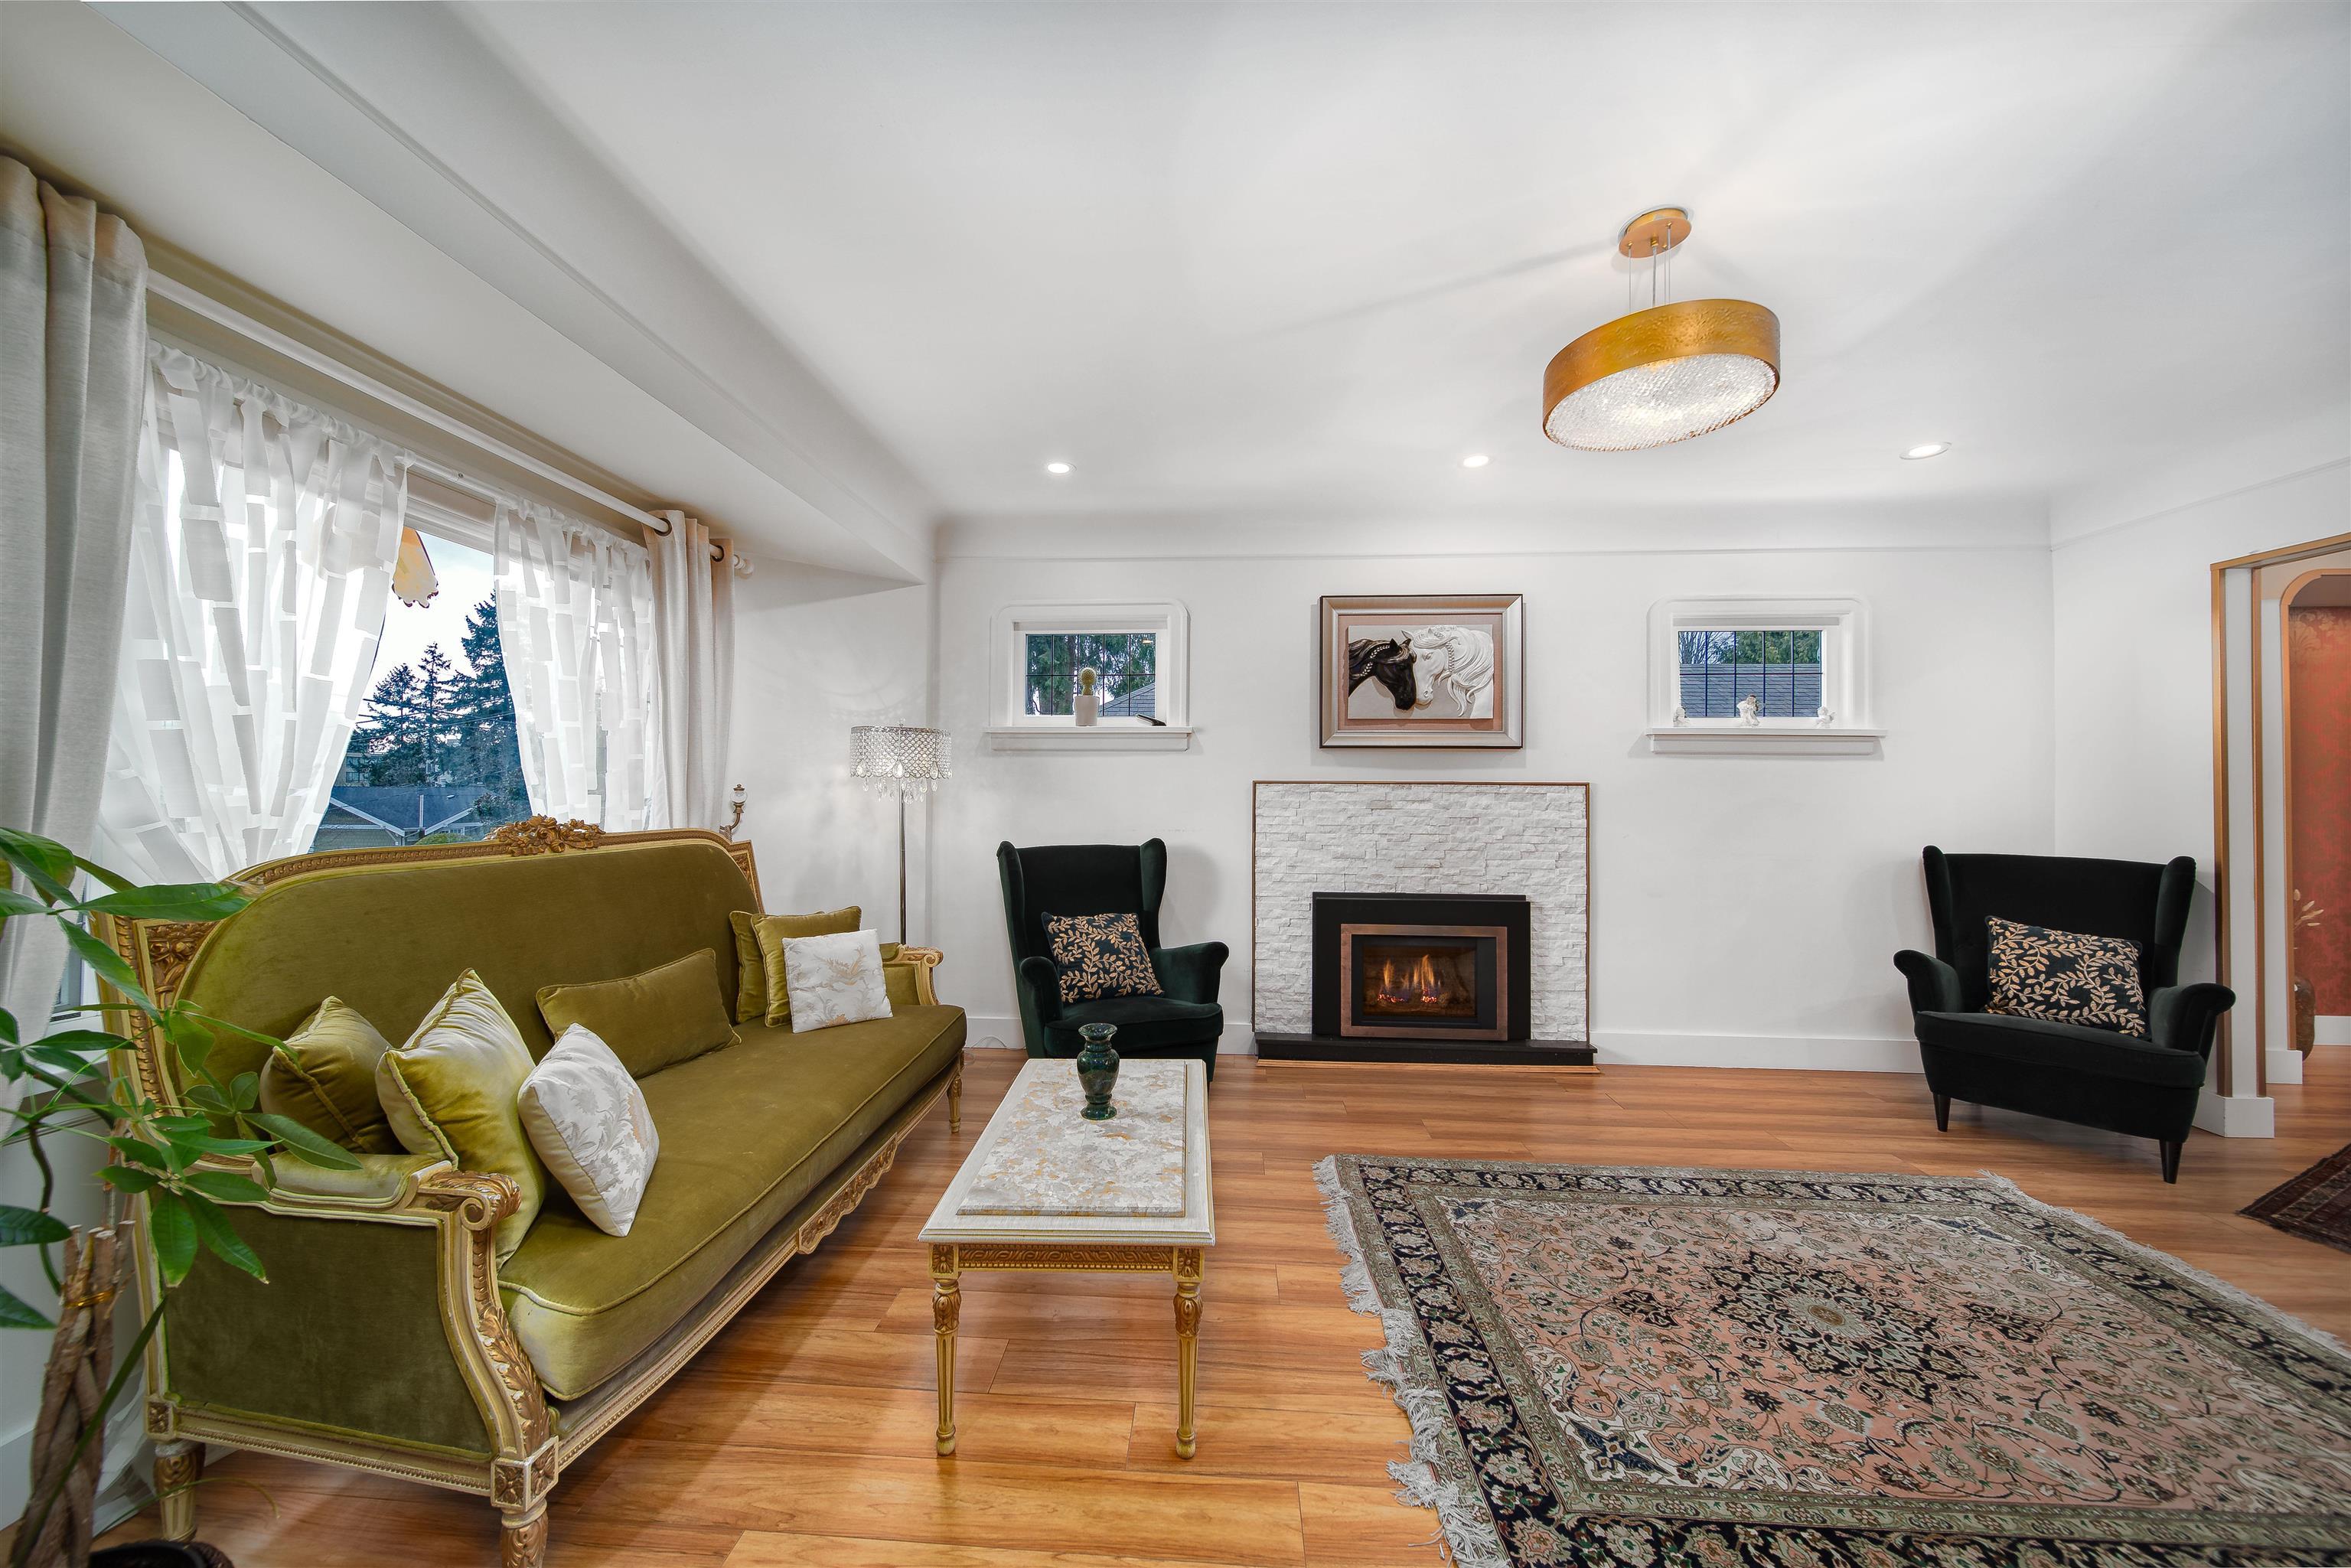 1357 FULTON AVENUE - Ambleside House/Single Family for sale, 6 Bedrooms (R2617731) - #9